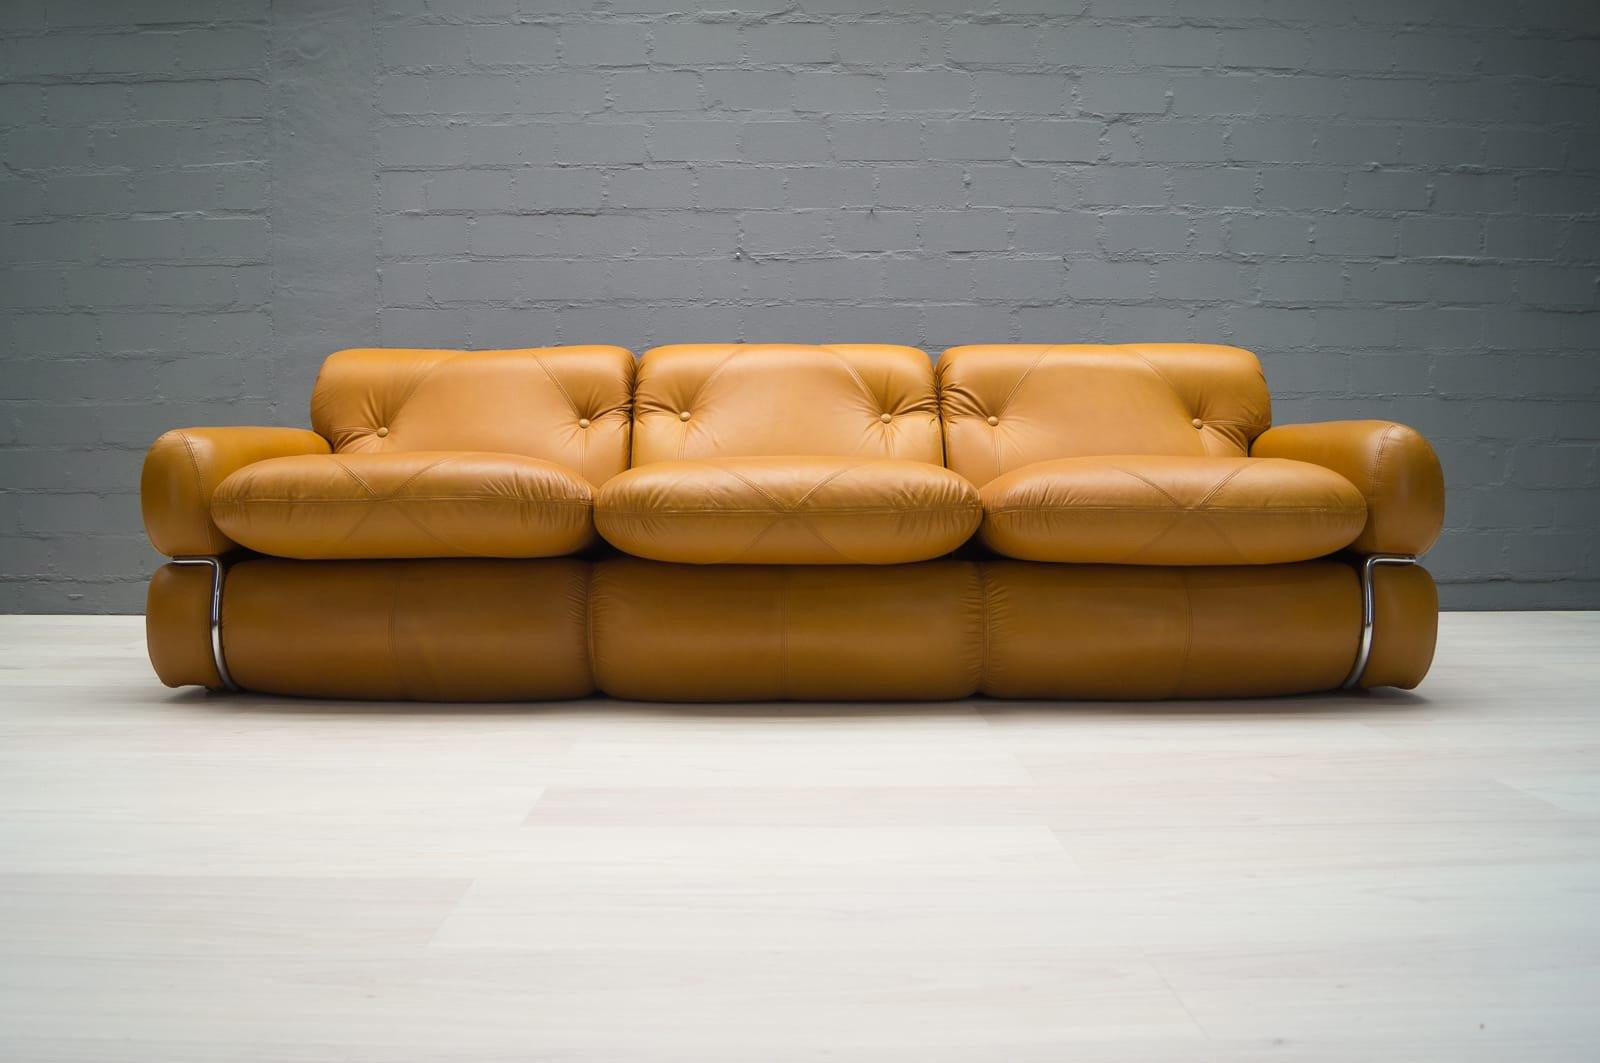 ledersofa italienisches design. Black Bedroom Furniture Sets. Home Design Ideas